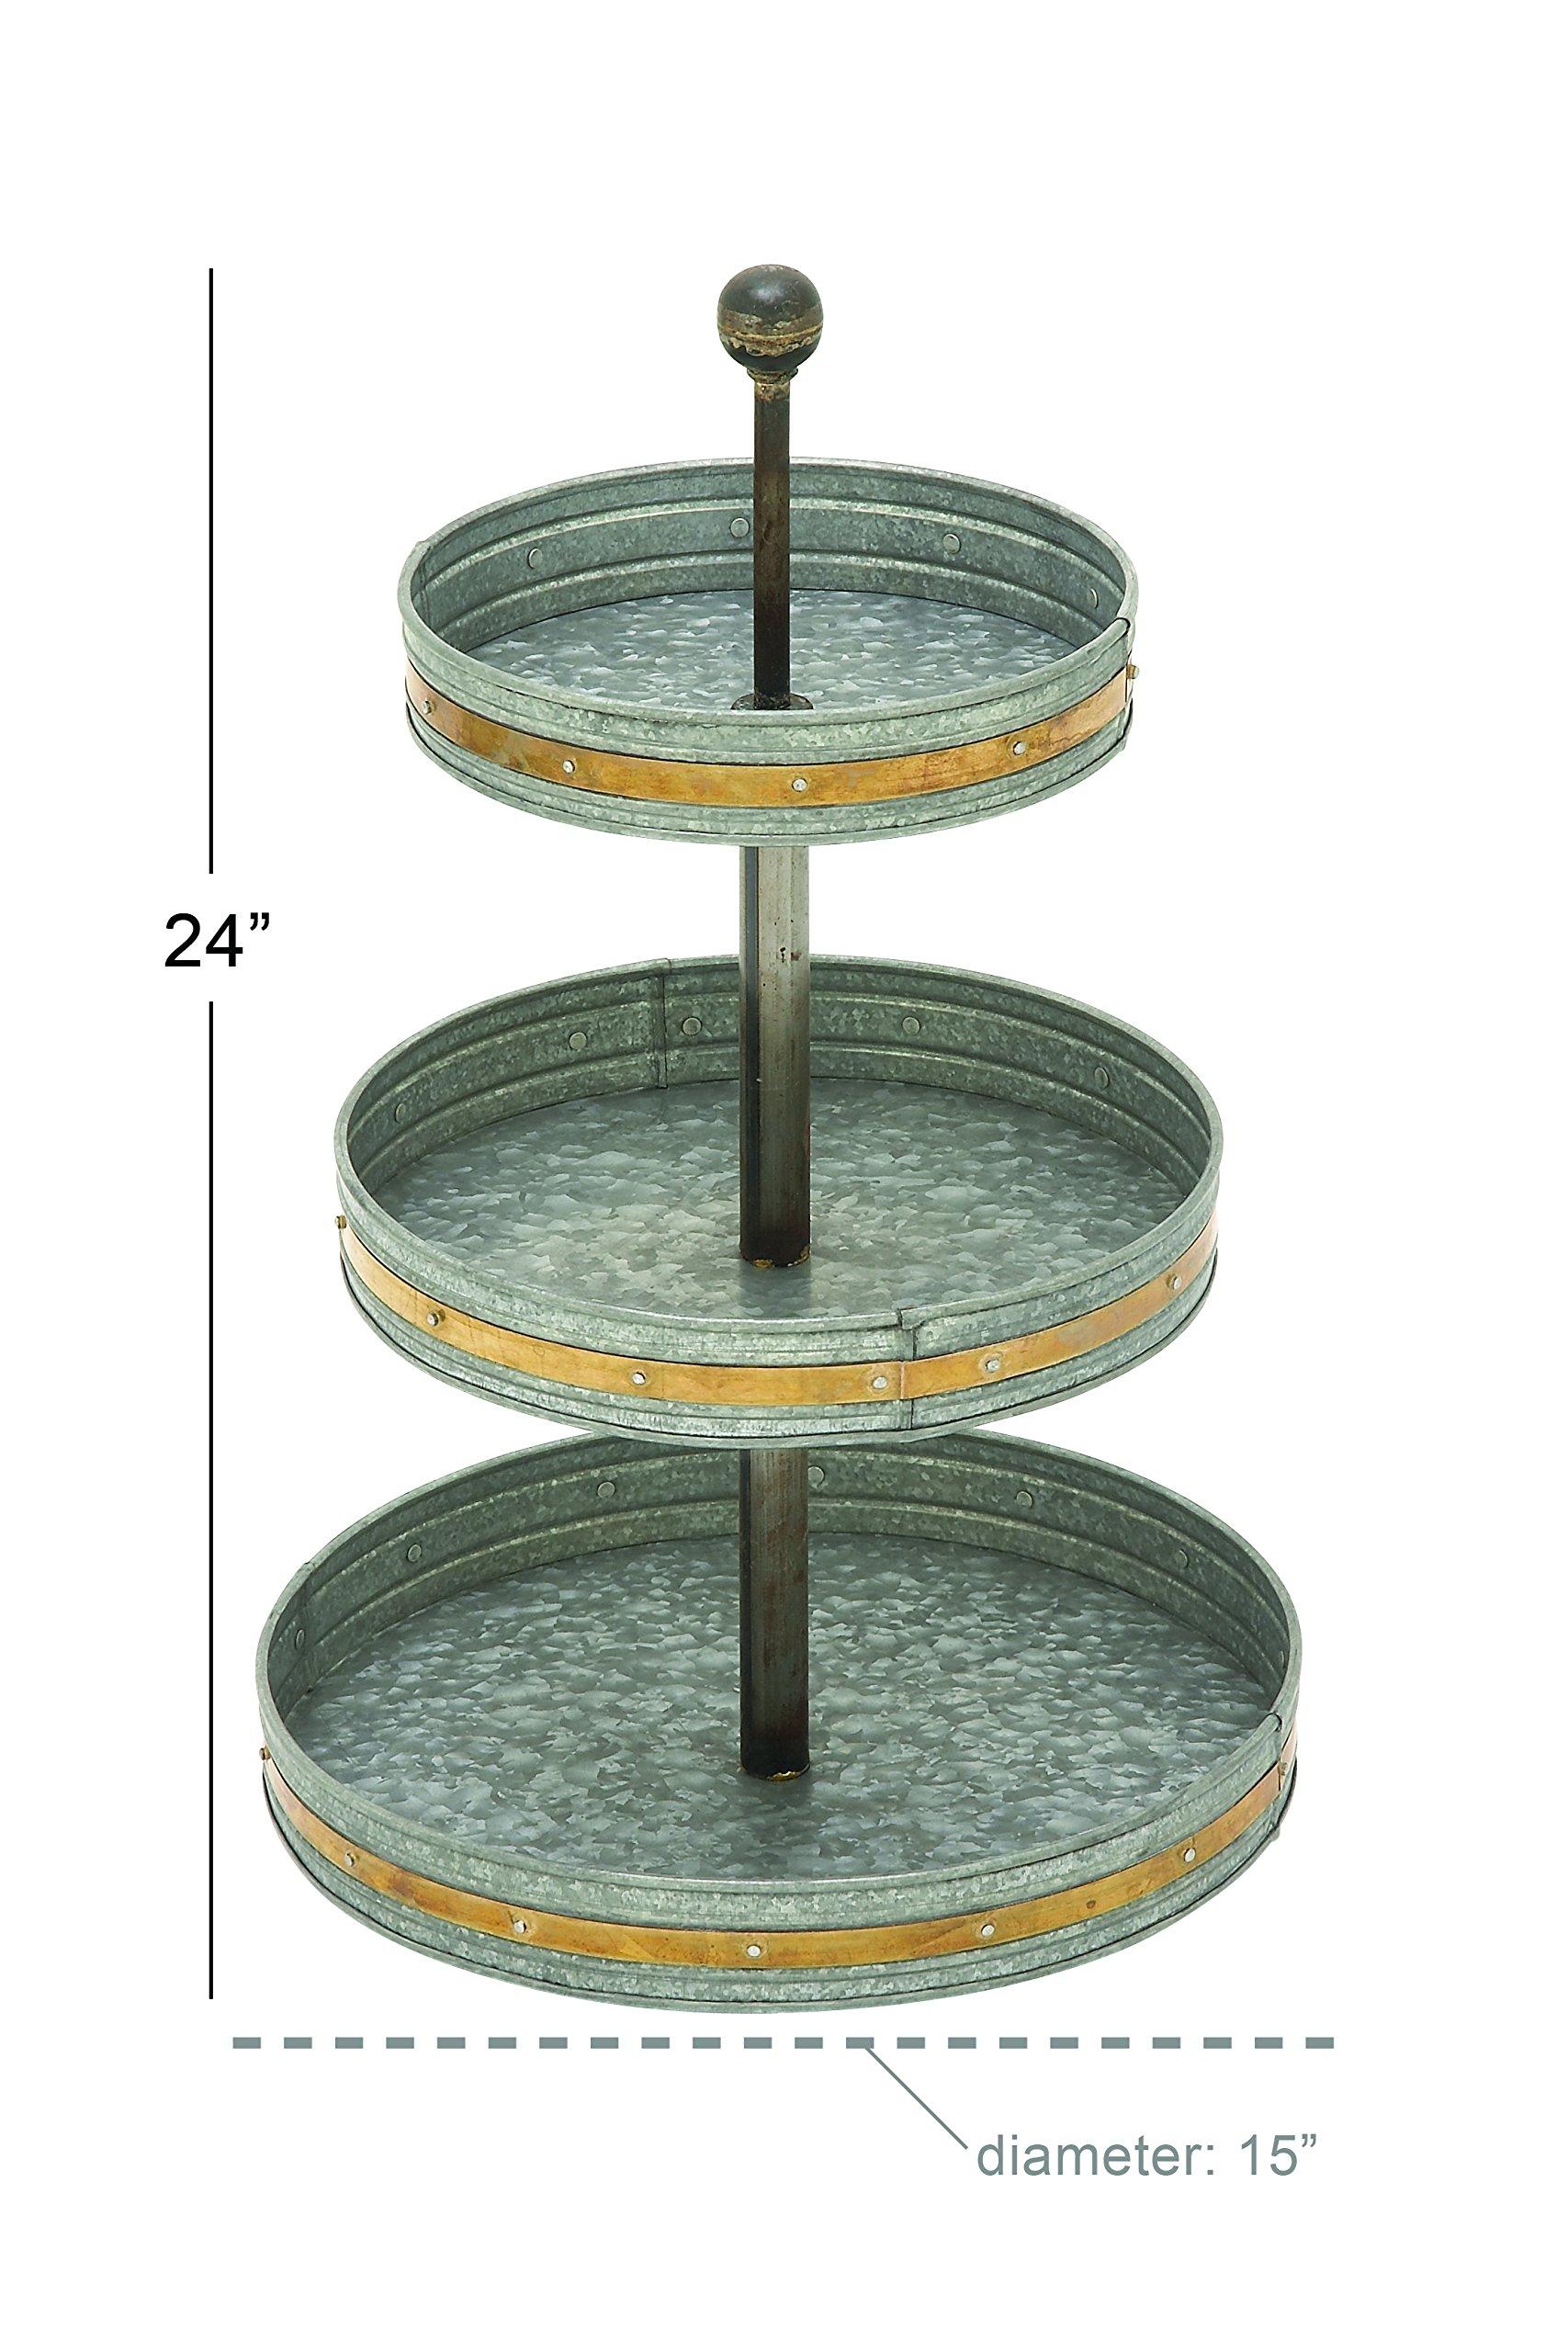 Deco 79 49193 Metal Galvanized 3 Tier Tray, 15'' x 24'' by Deco 79